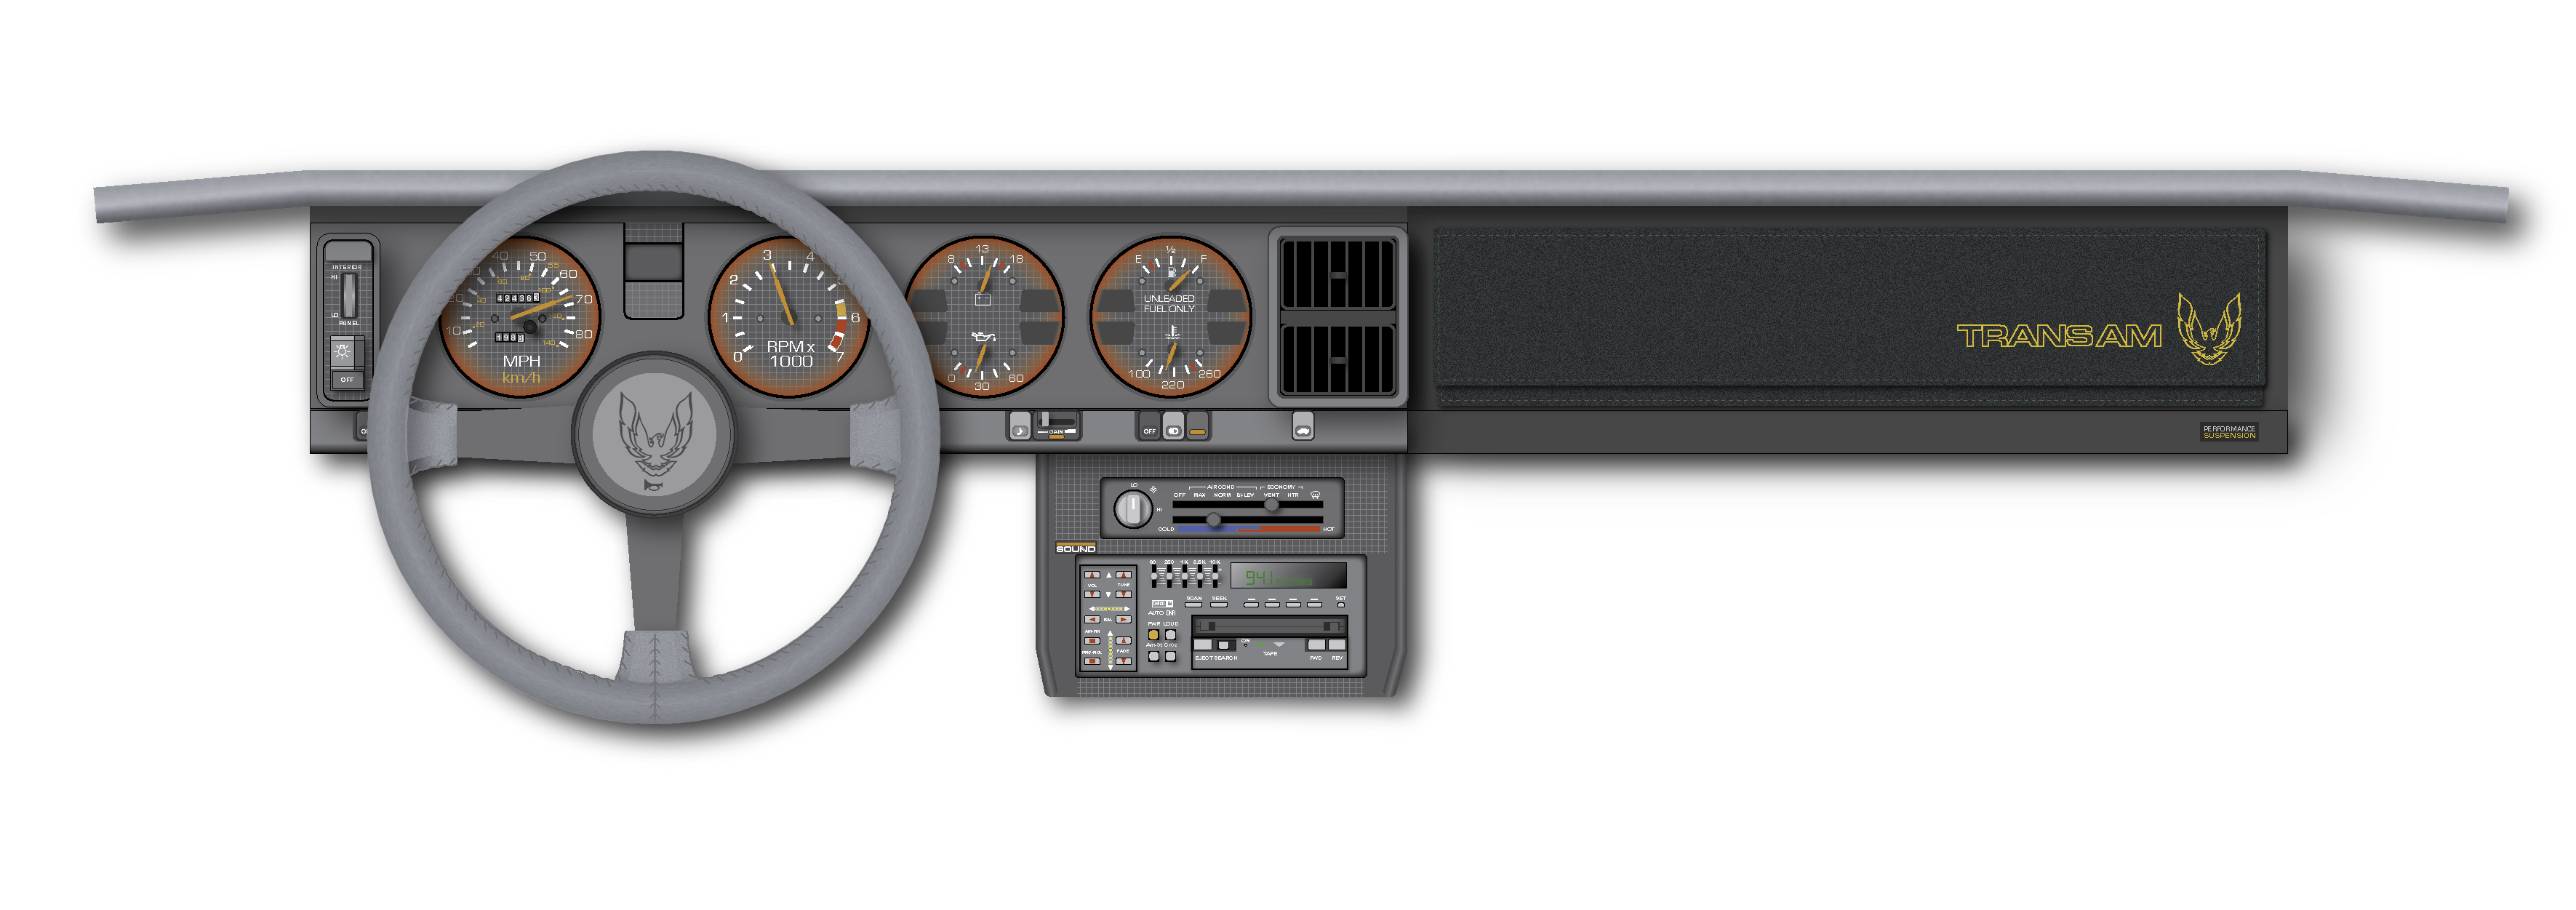 1985 Pontiac Firebird Trans Am Coupe Tuned Port Injection ...  |1985 Firebird Price Bra